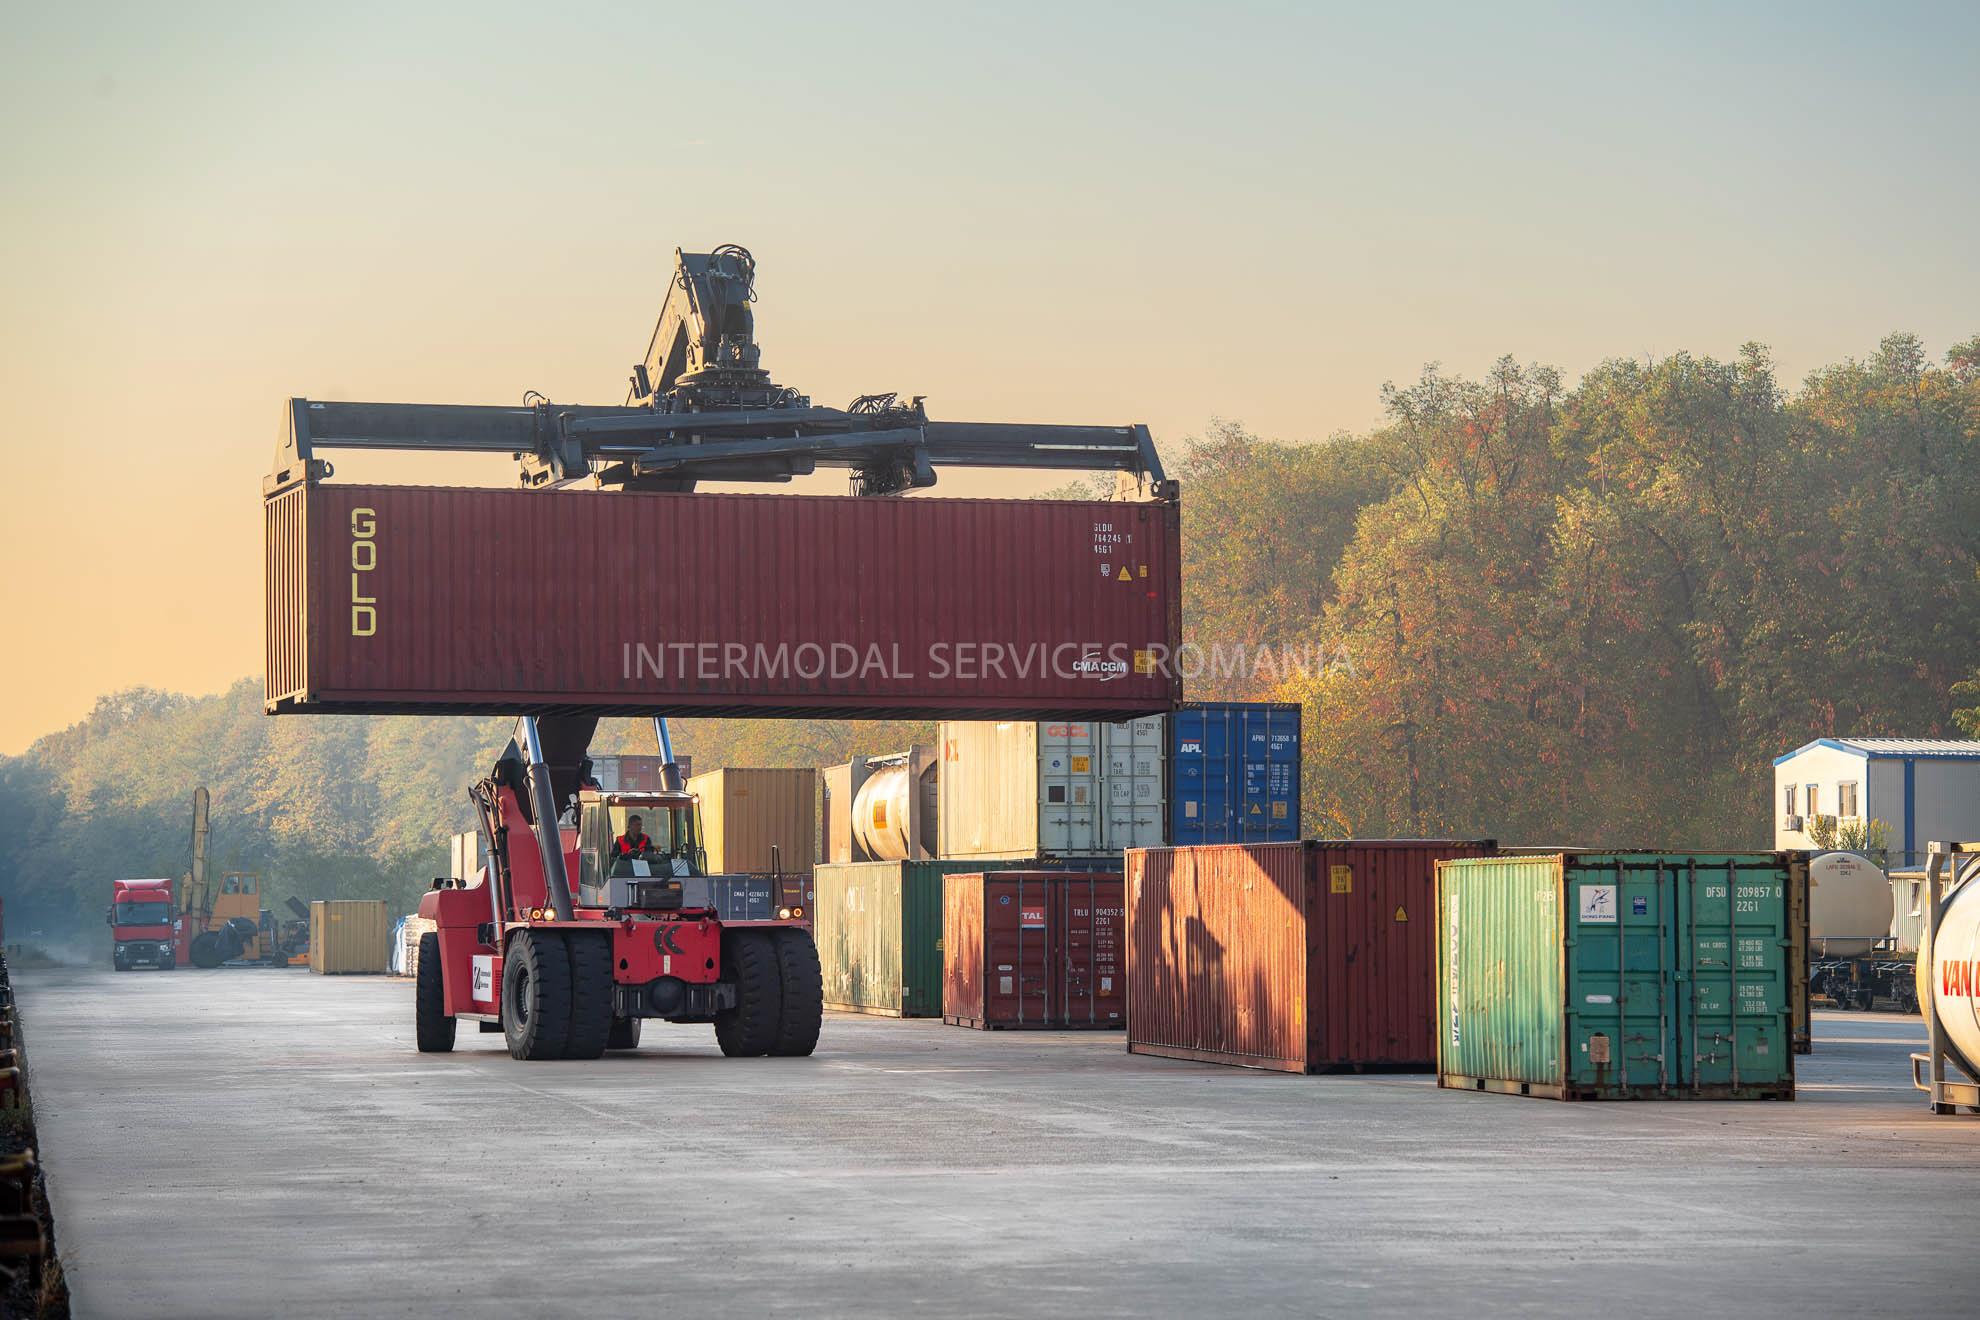 Intermodal-Services-Ploiesti-web-22